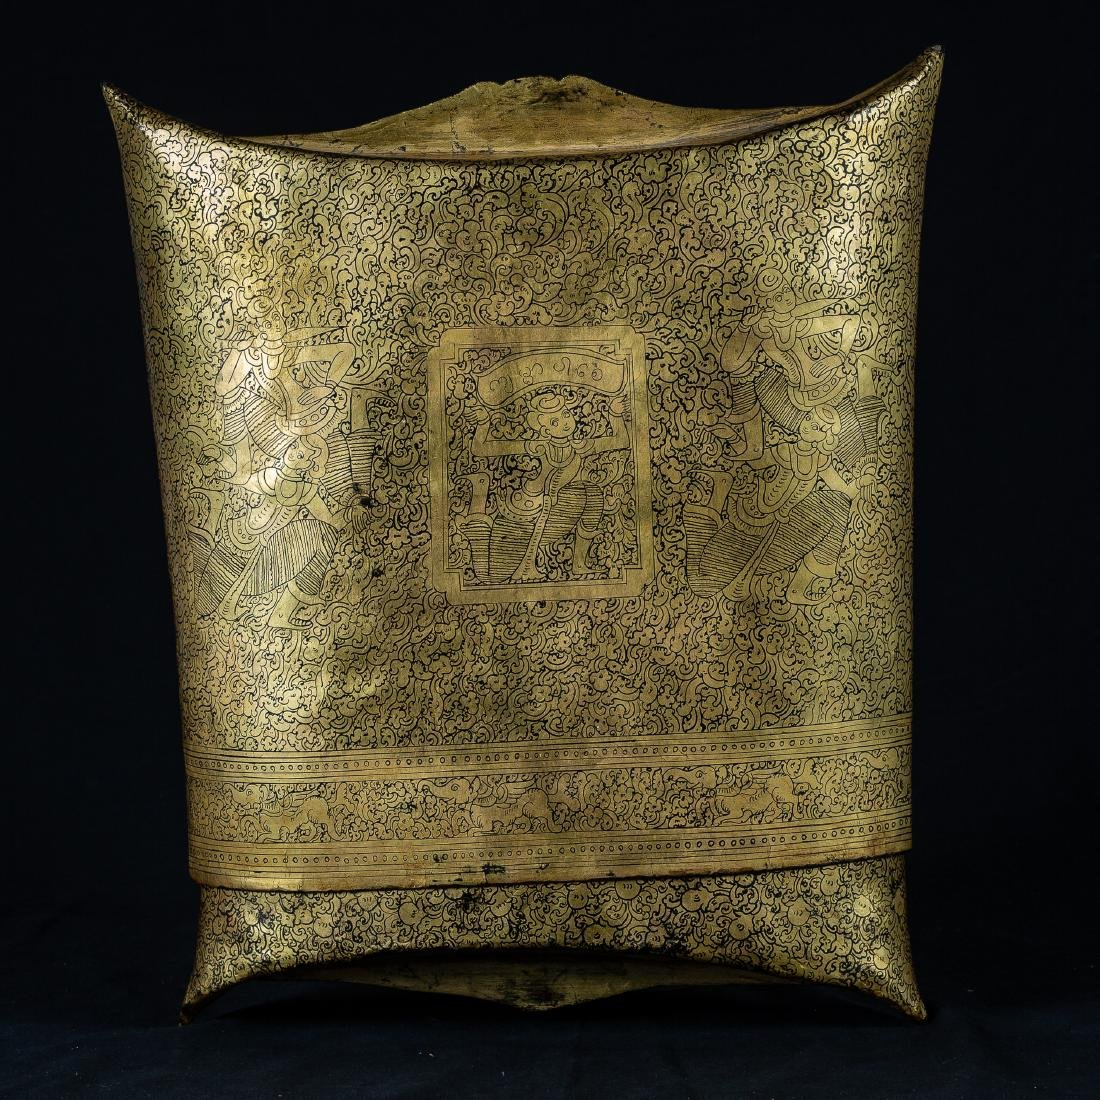 19th Century Burmese Shwe Zawa Lacquer Money Pouch - 7